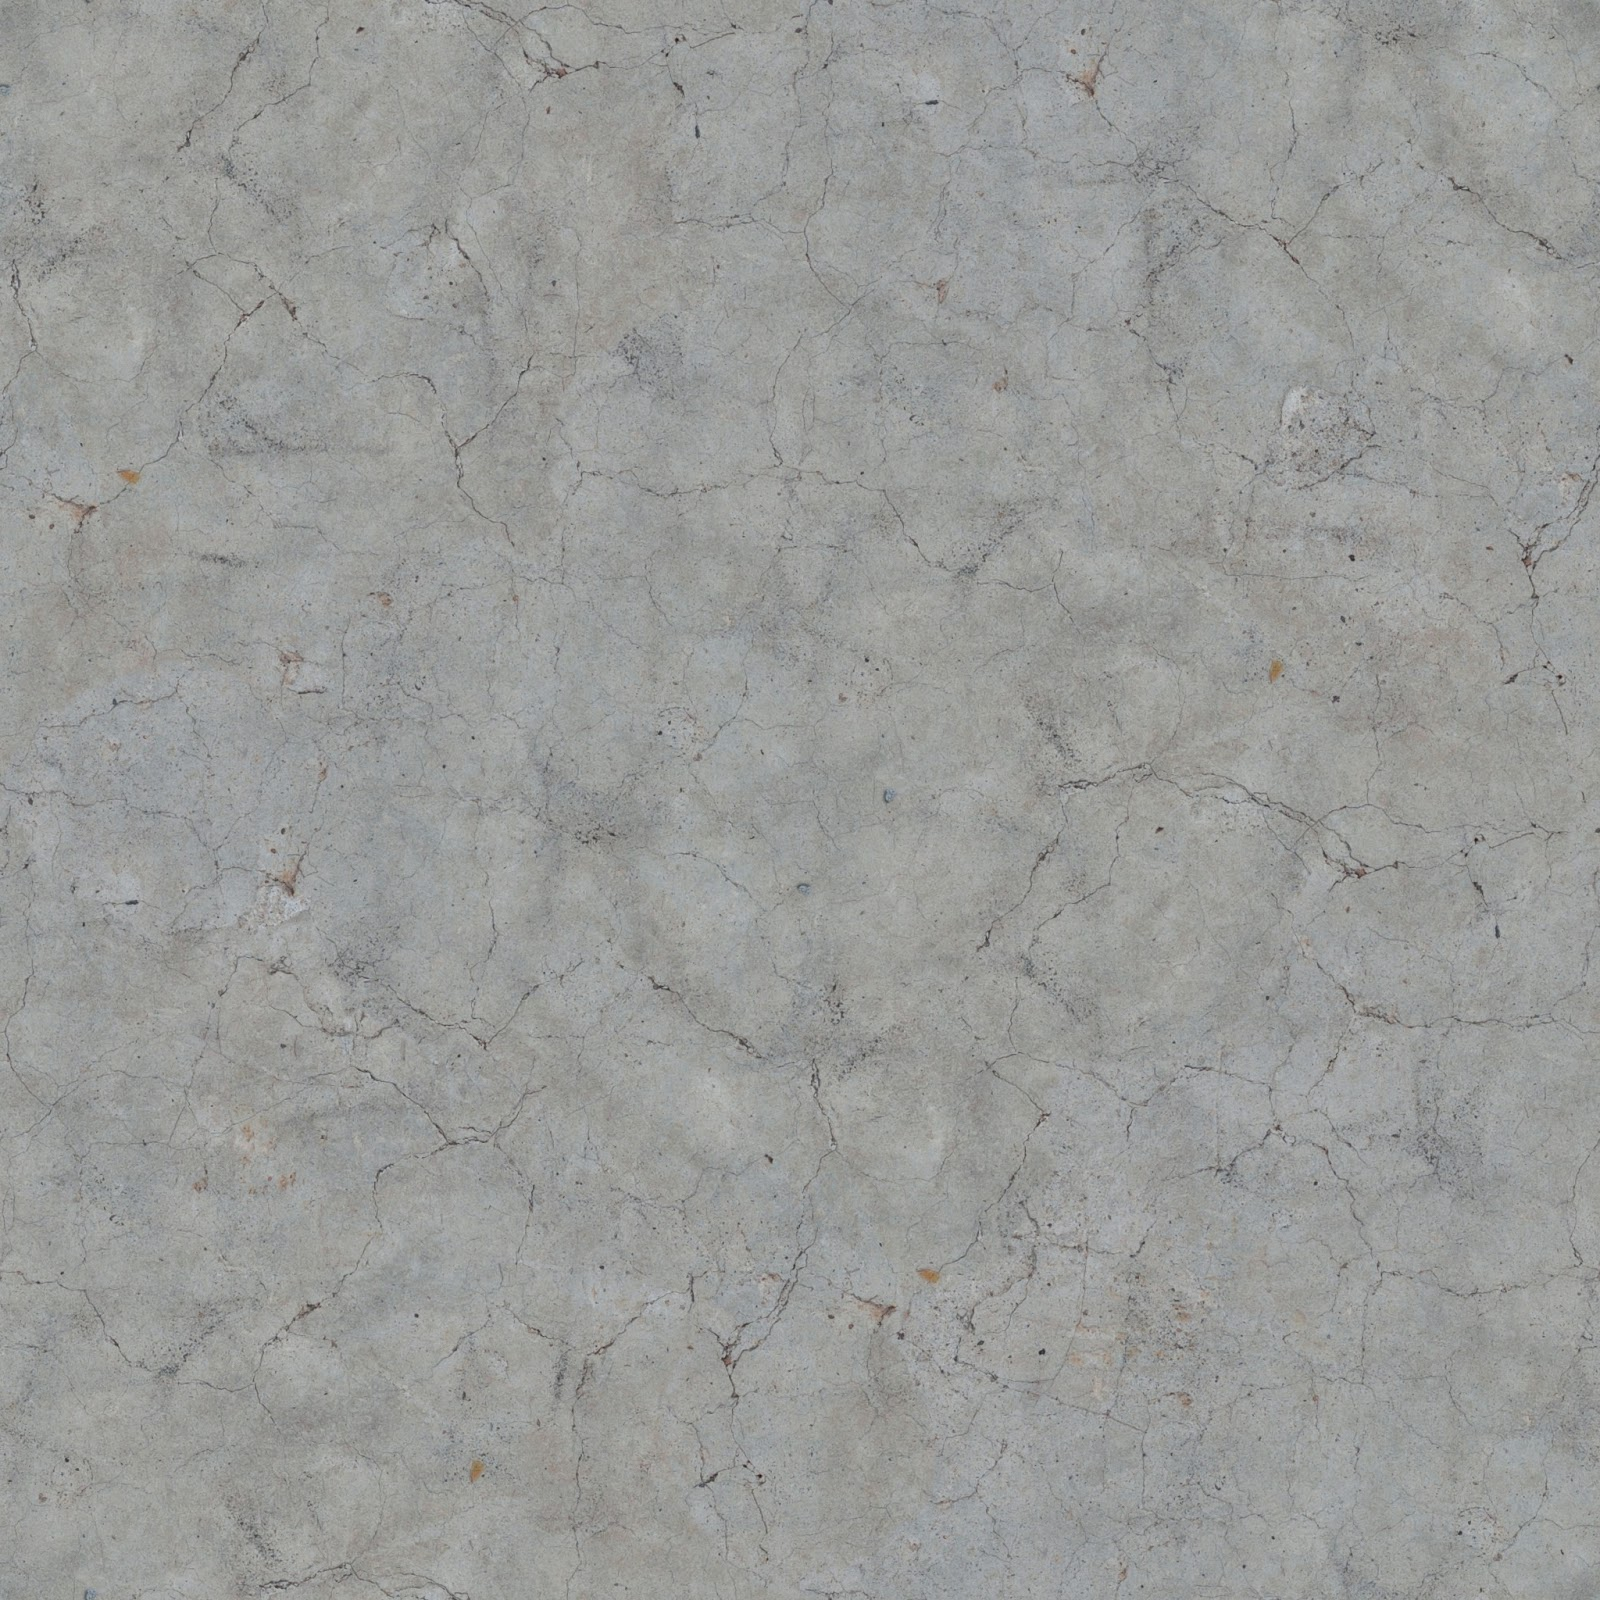 HIGH RESOLUTION SEAMLESS TEXTURES: Concrete